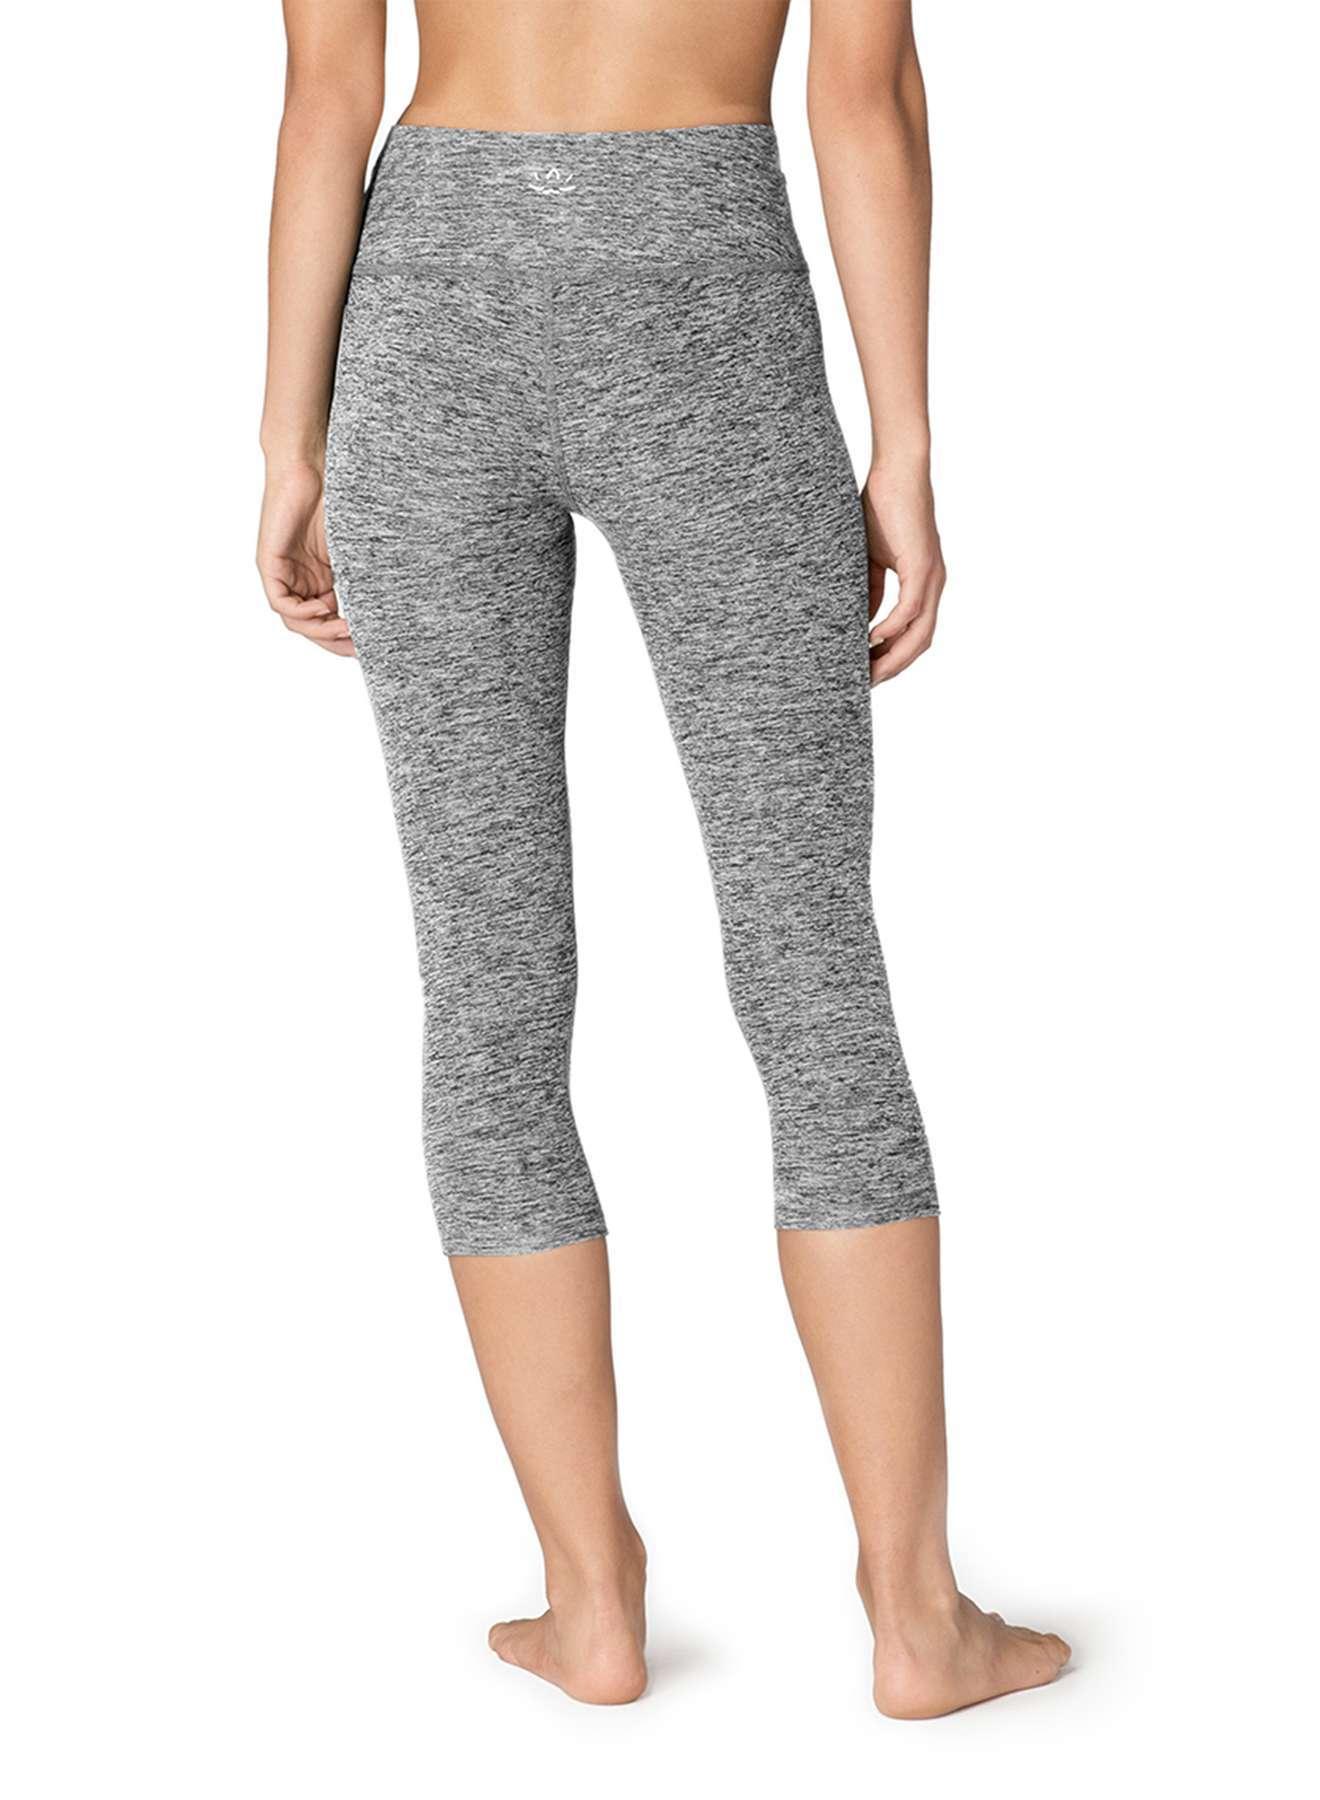 Beyond Yoga Spacedye capris yoga leggings black white